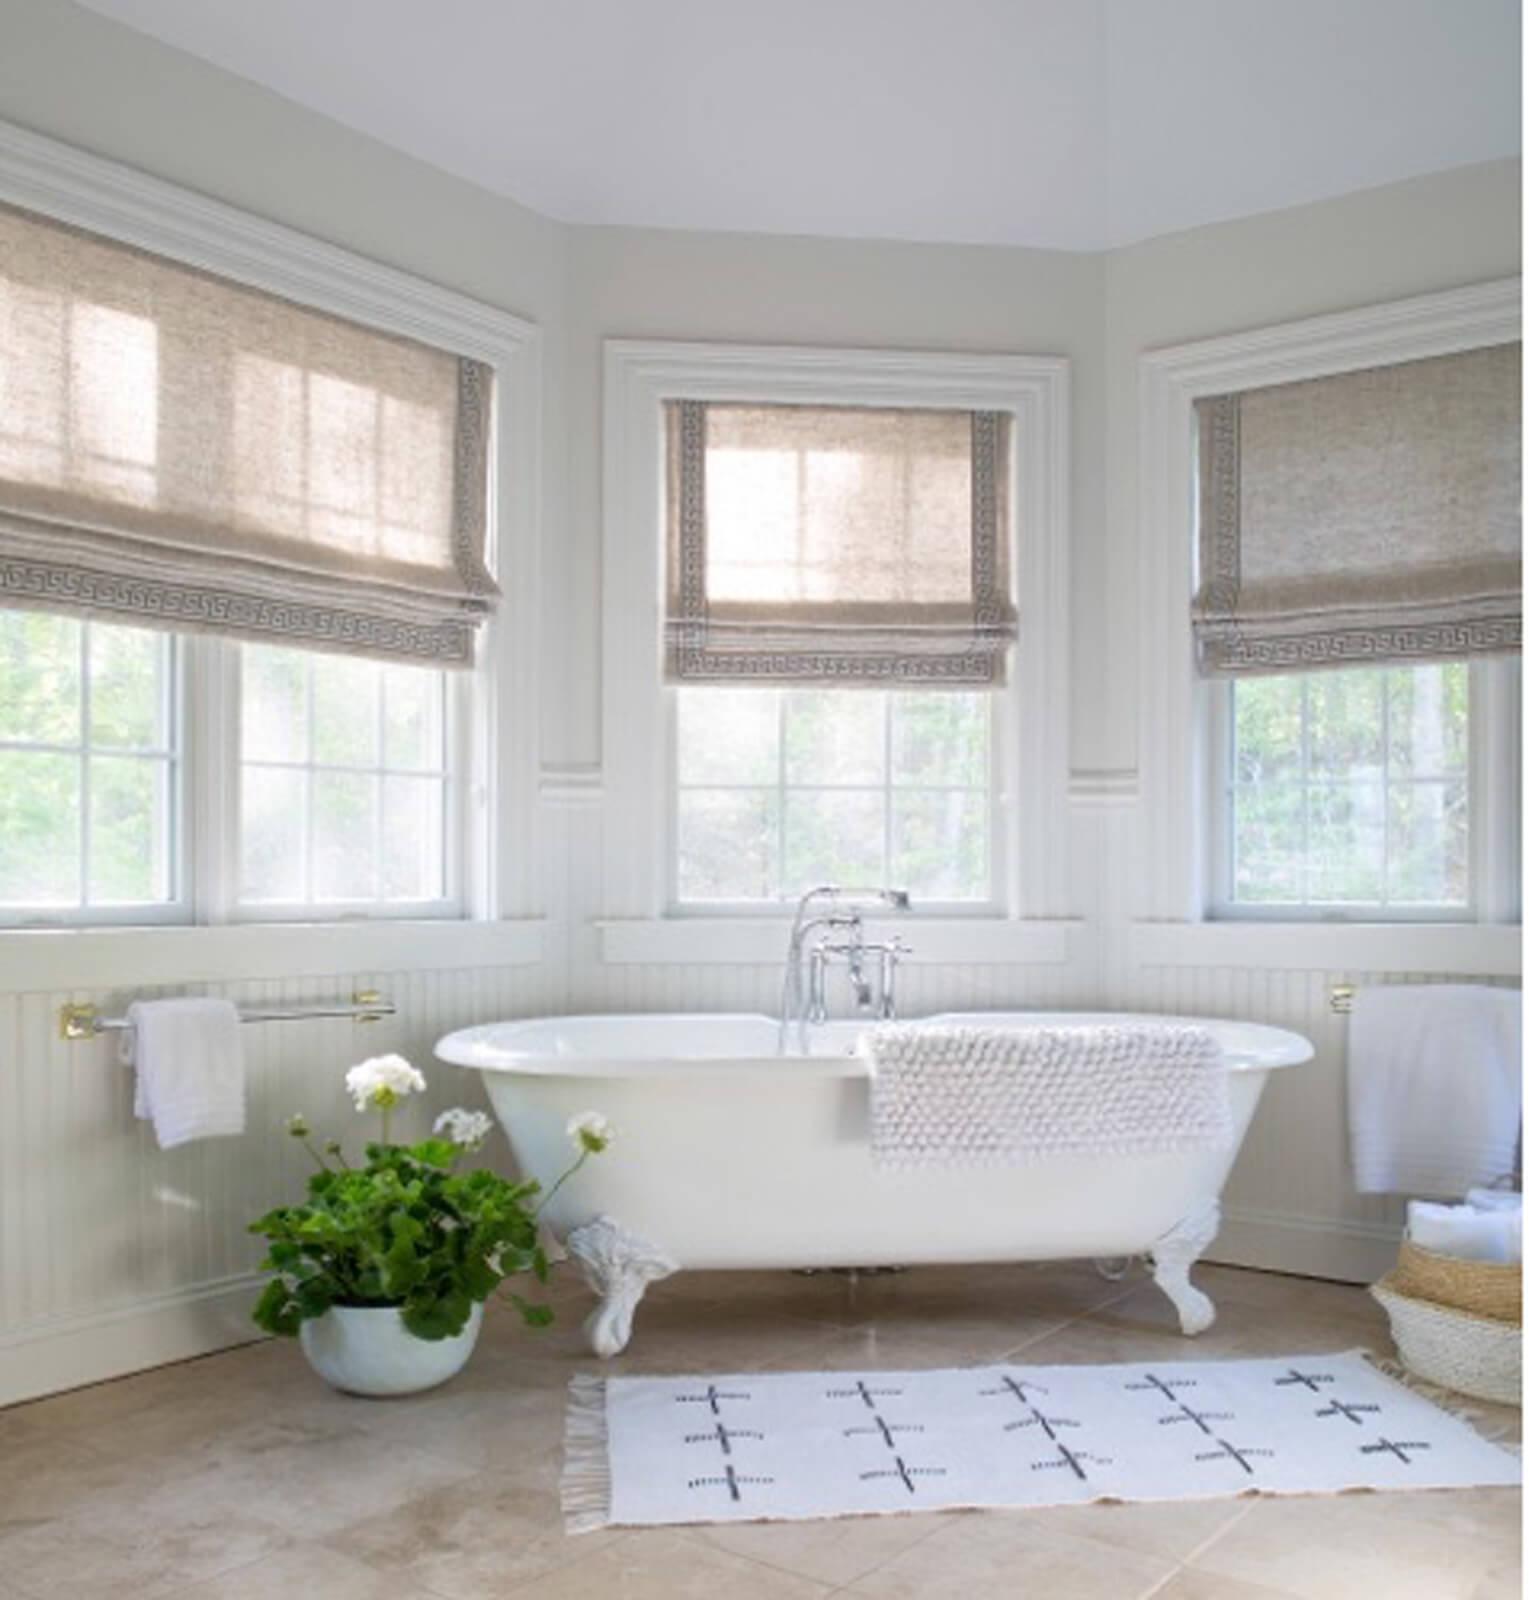 Bathroom_walls_painted_with_Aura_Bath_Spa_Matte.jpg